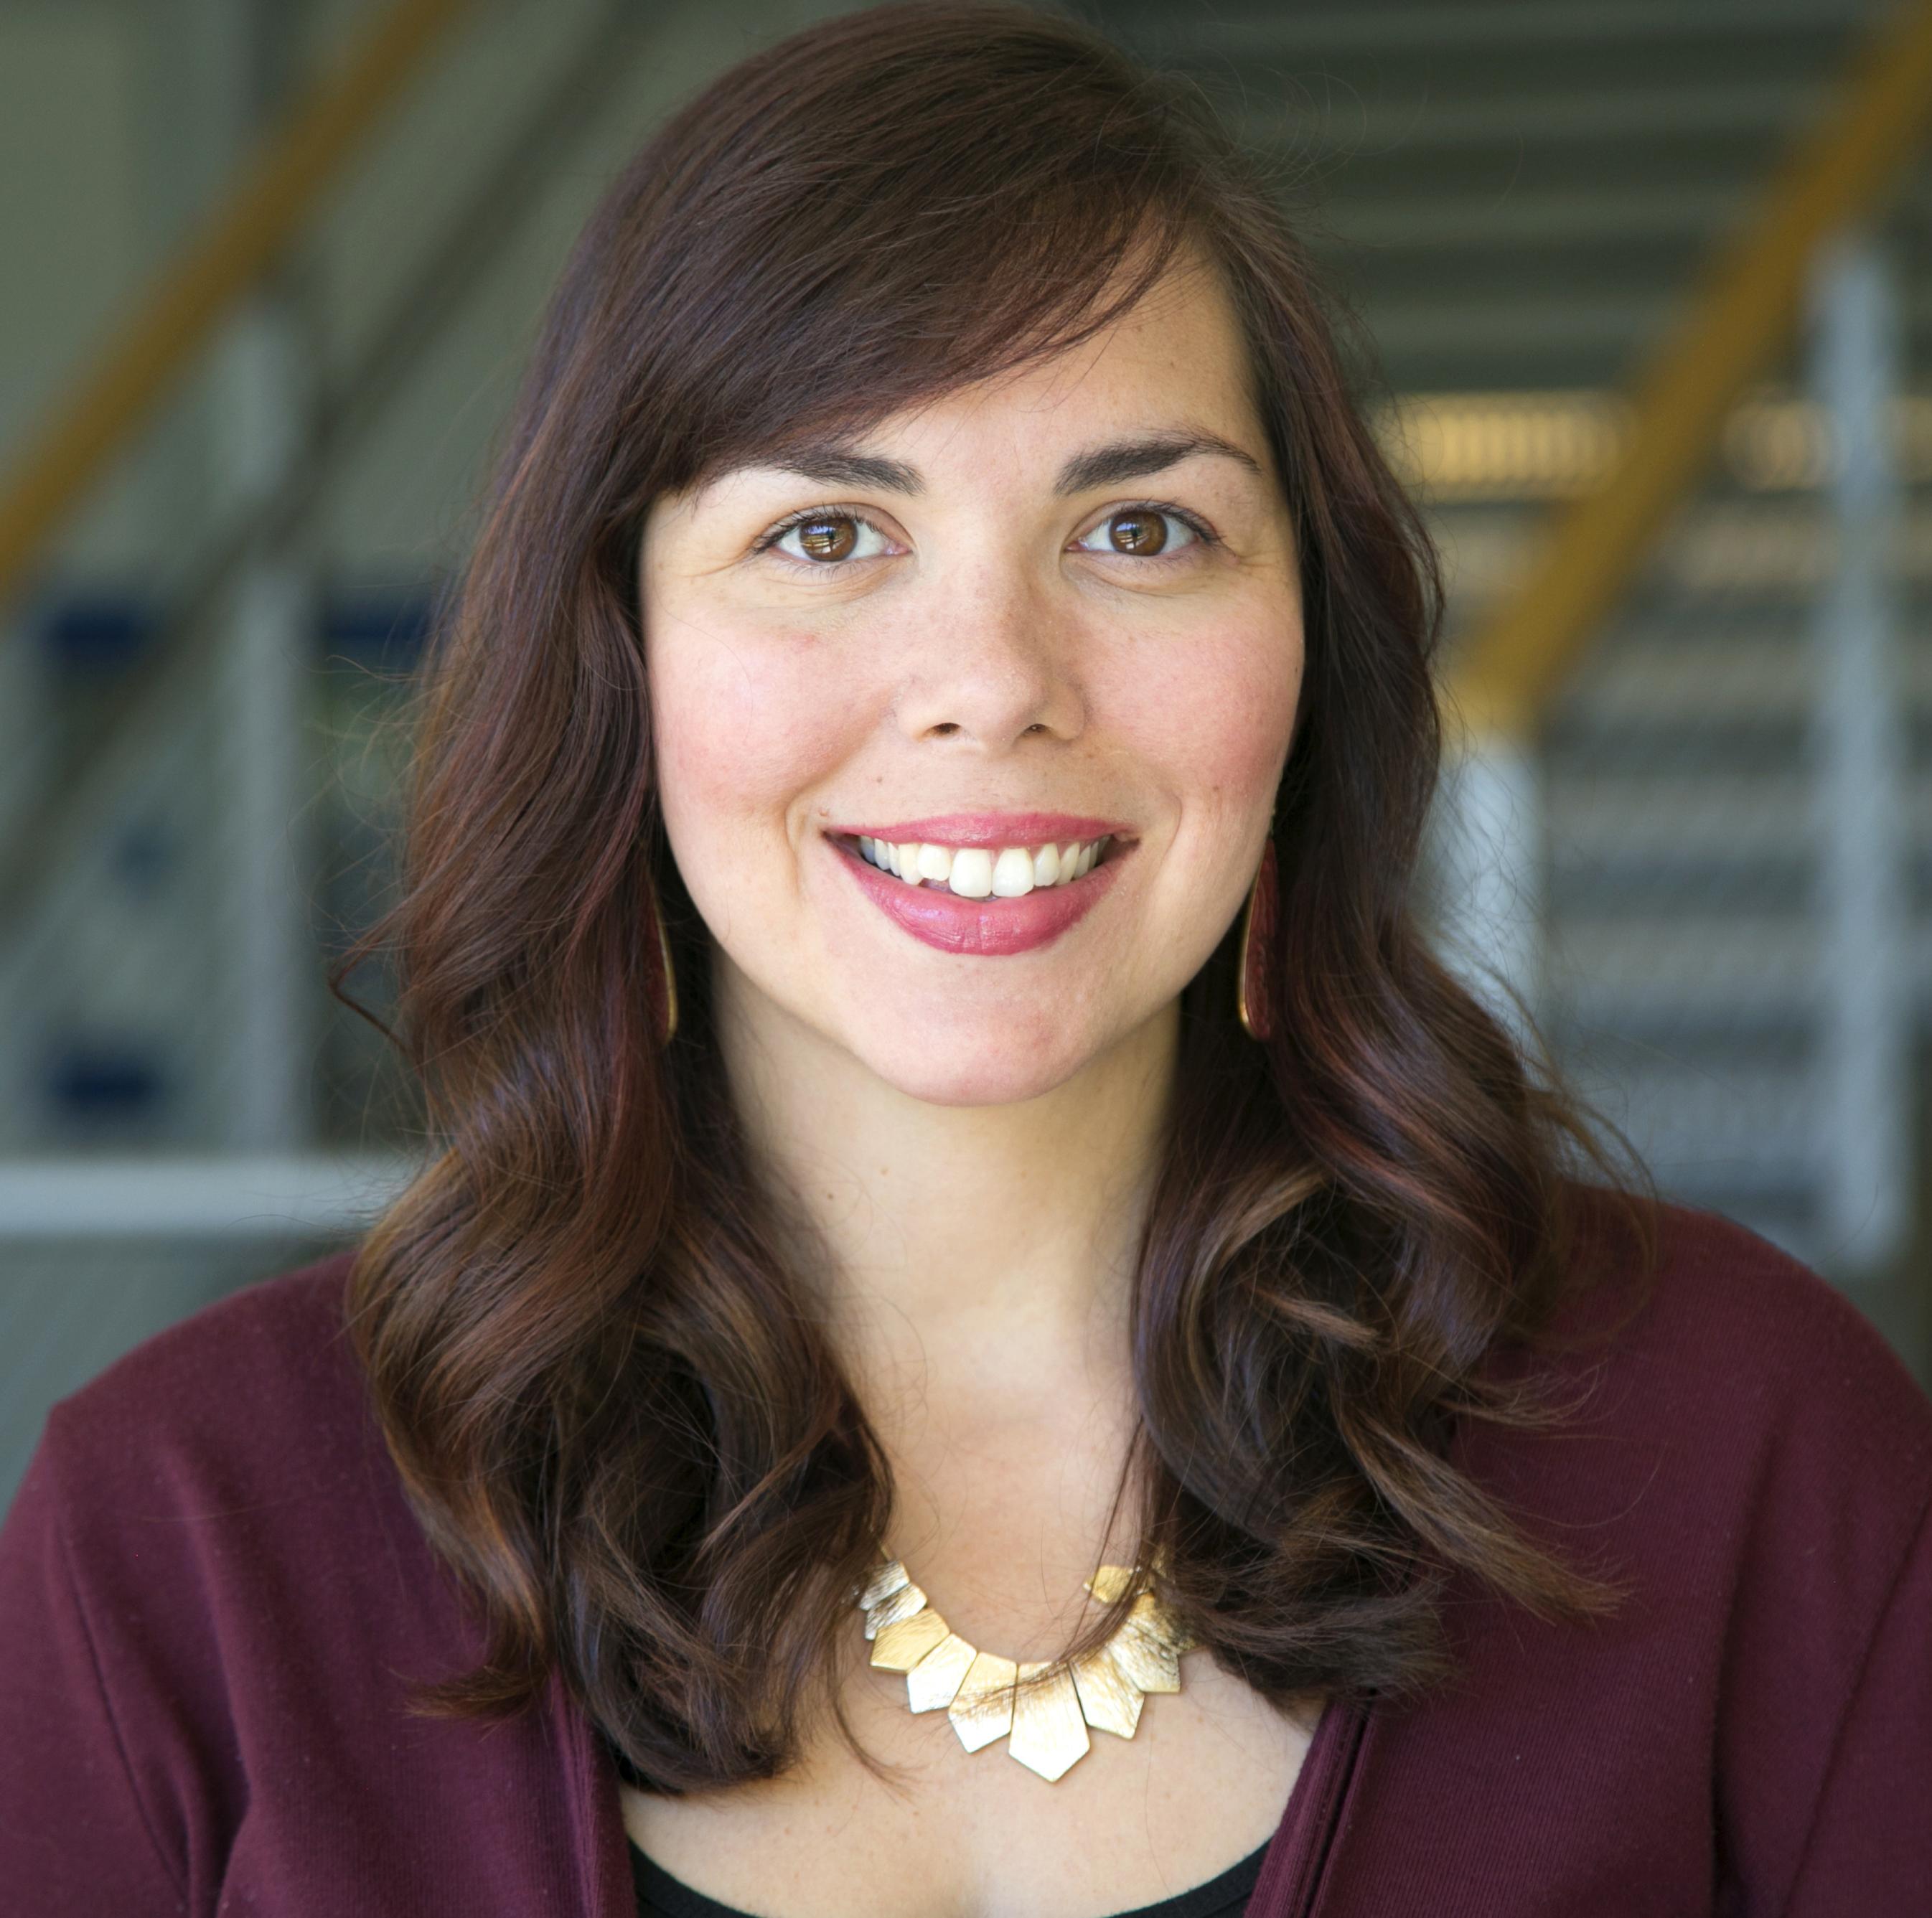 Name: Lora Stevens Uniquename: slora Department: CfE  Photo: Akhil Kantipuly Michigan Engineering Communications & Marketing